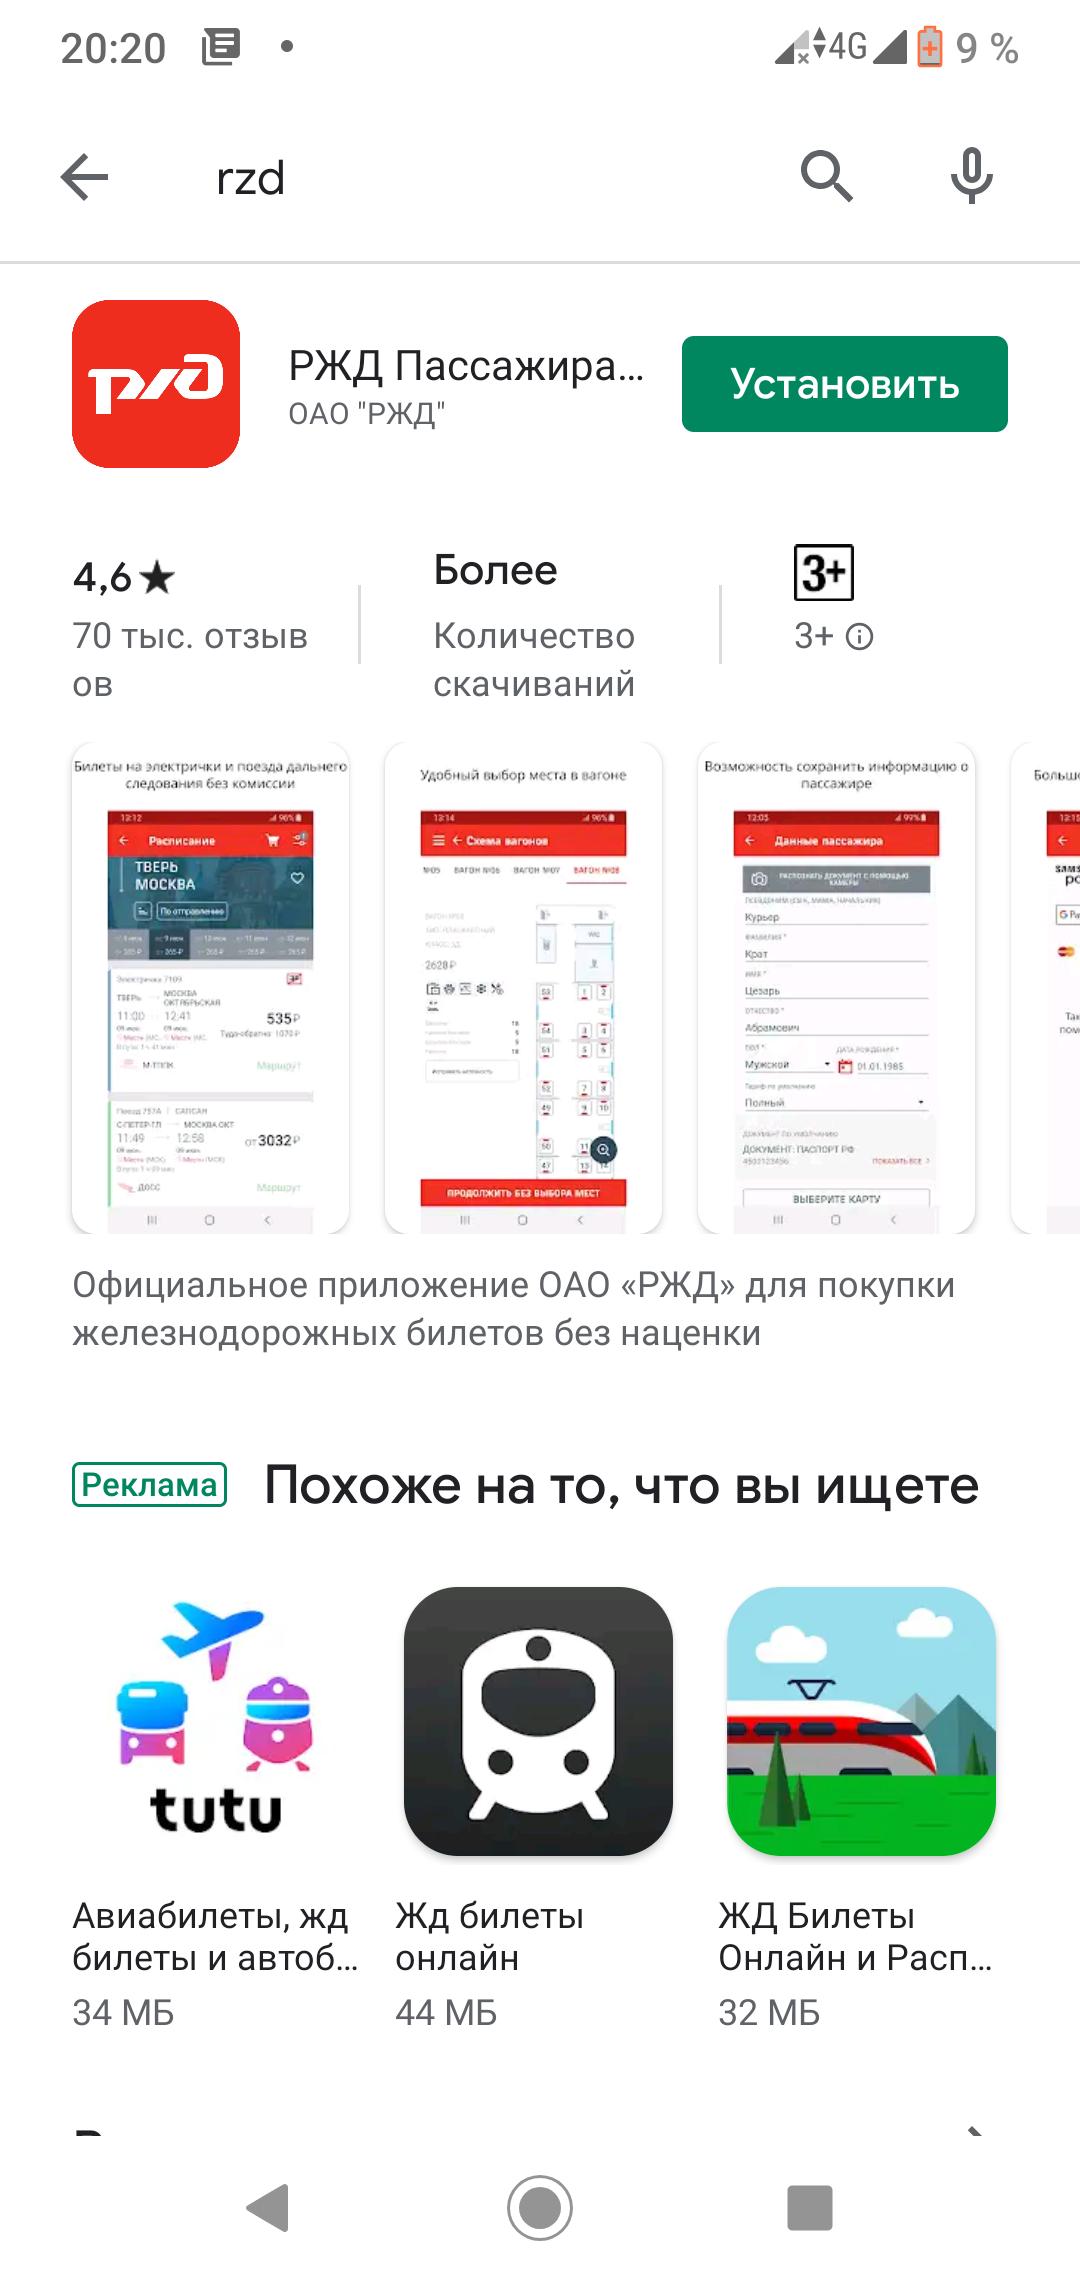 httpstools.seoinsane.rufilesimages5721poisk-prilozheniya-v-poiske-android-pley-4.png